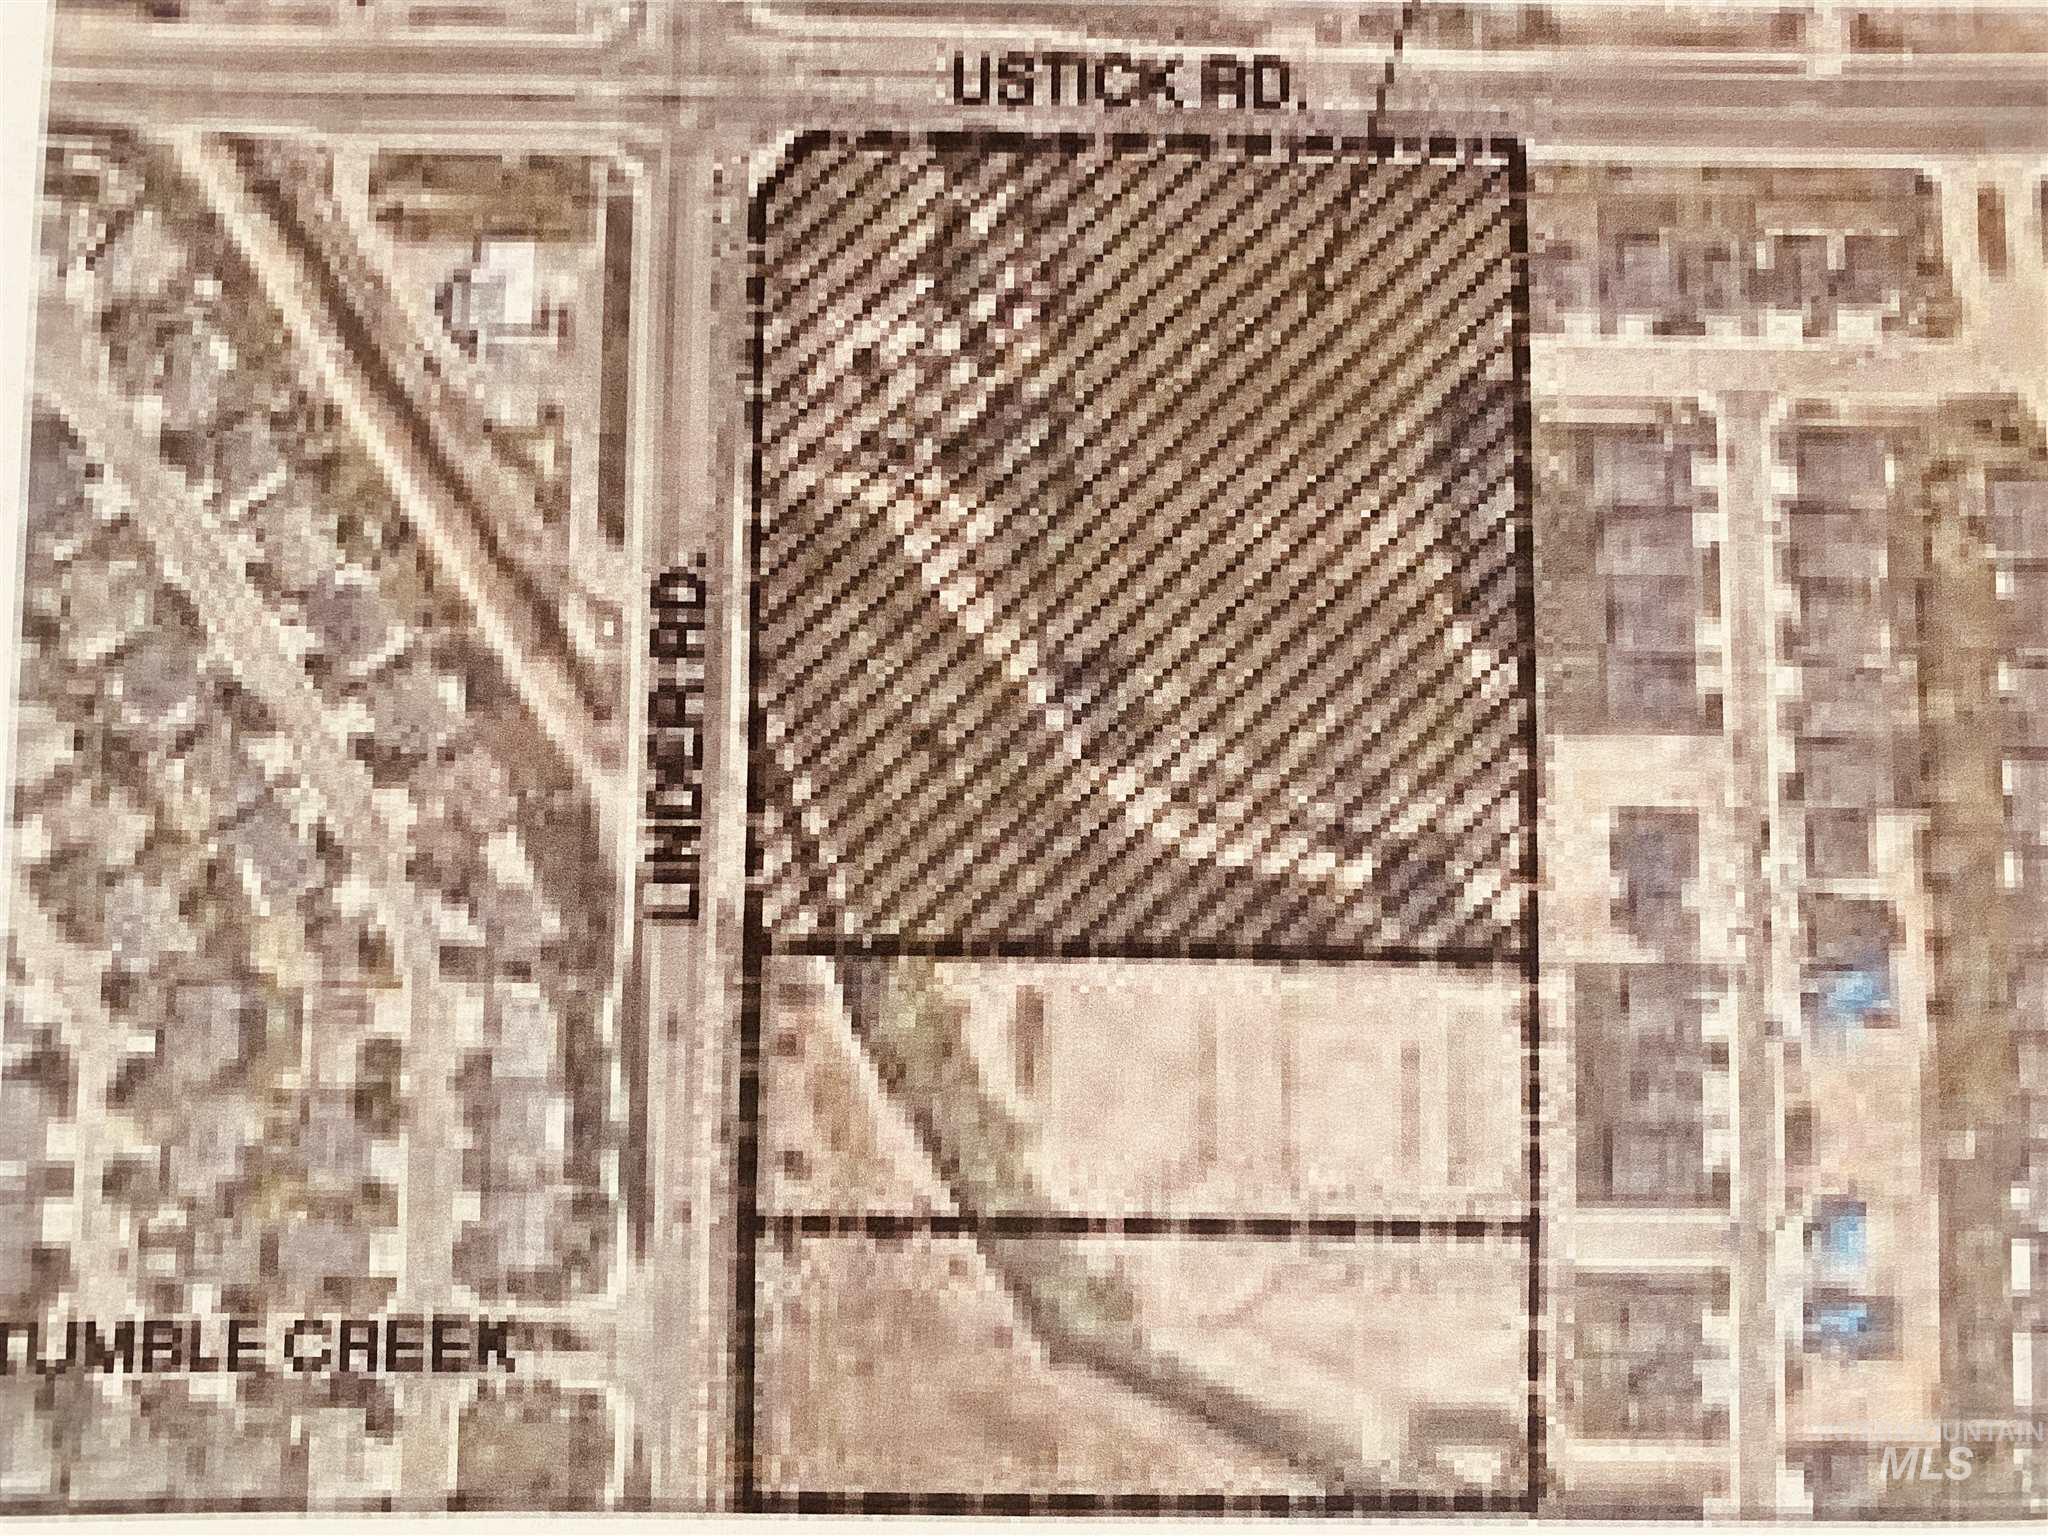 1515 W Ustick Rd Property Photo 1